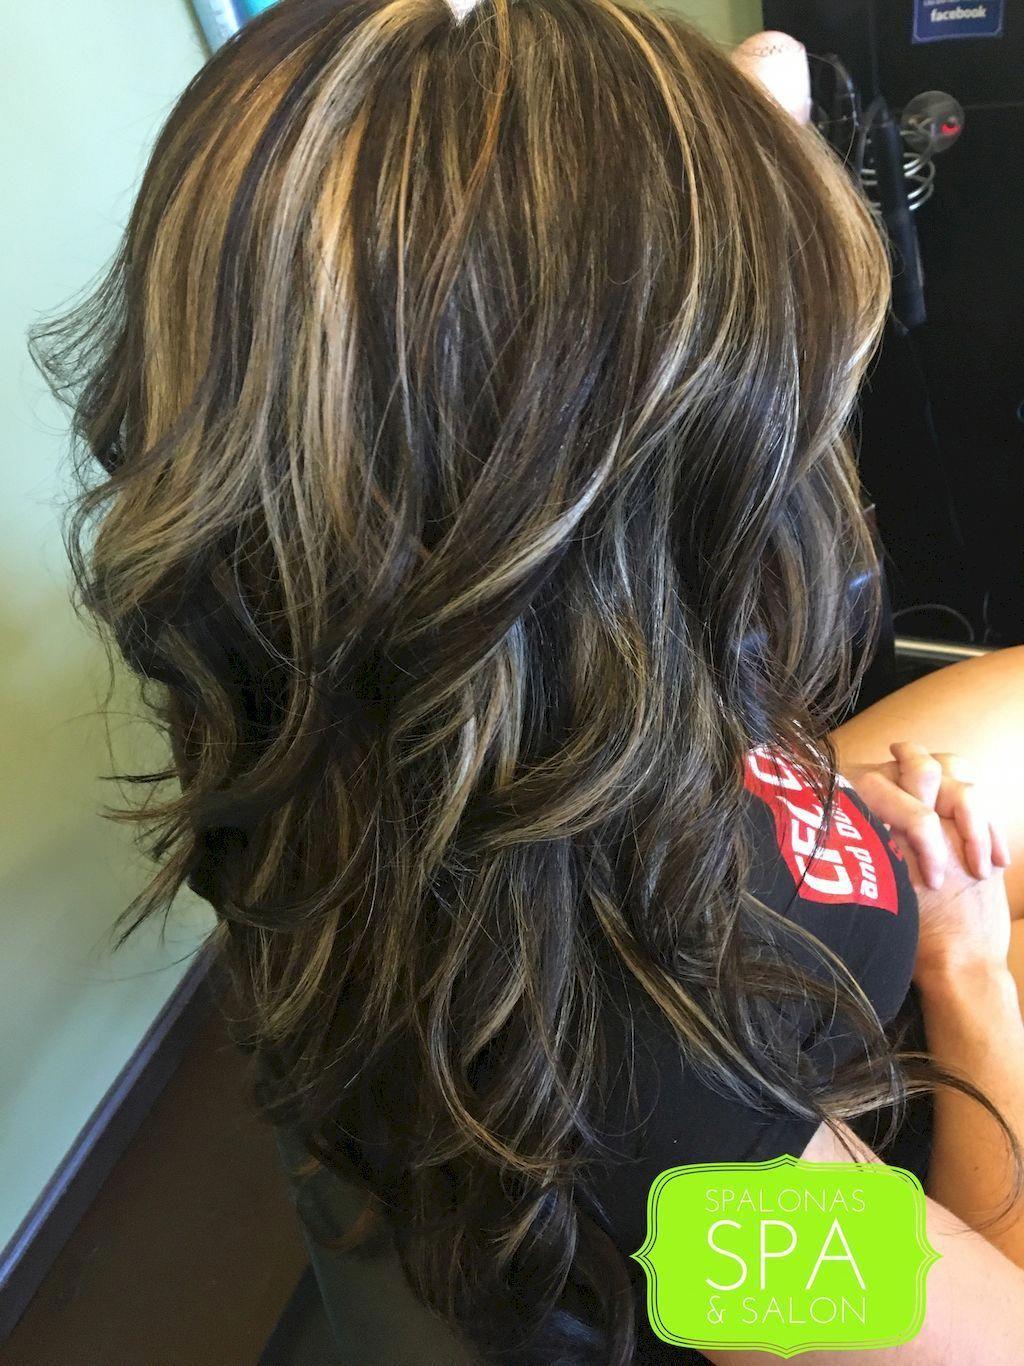 Hairhighlights Blending Gray Hair Hair Highlights Gray Hair Highlights